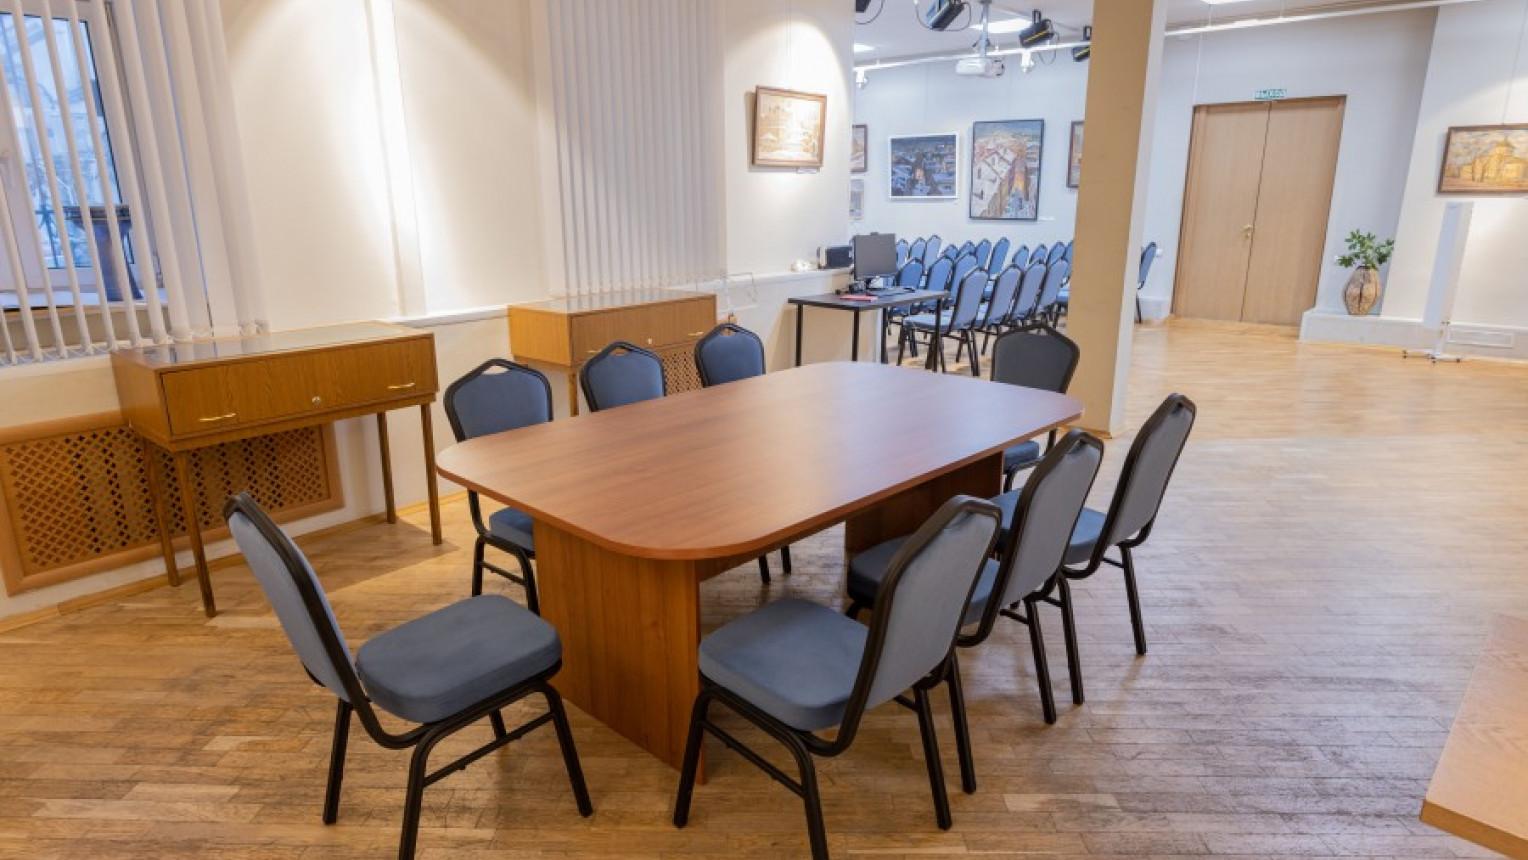 Зал для семинаров, презентаций, тренингов - фото №1